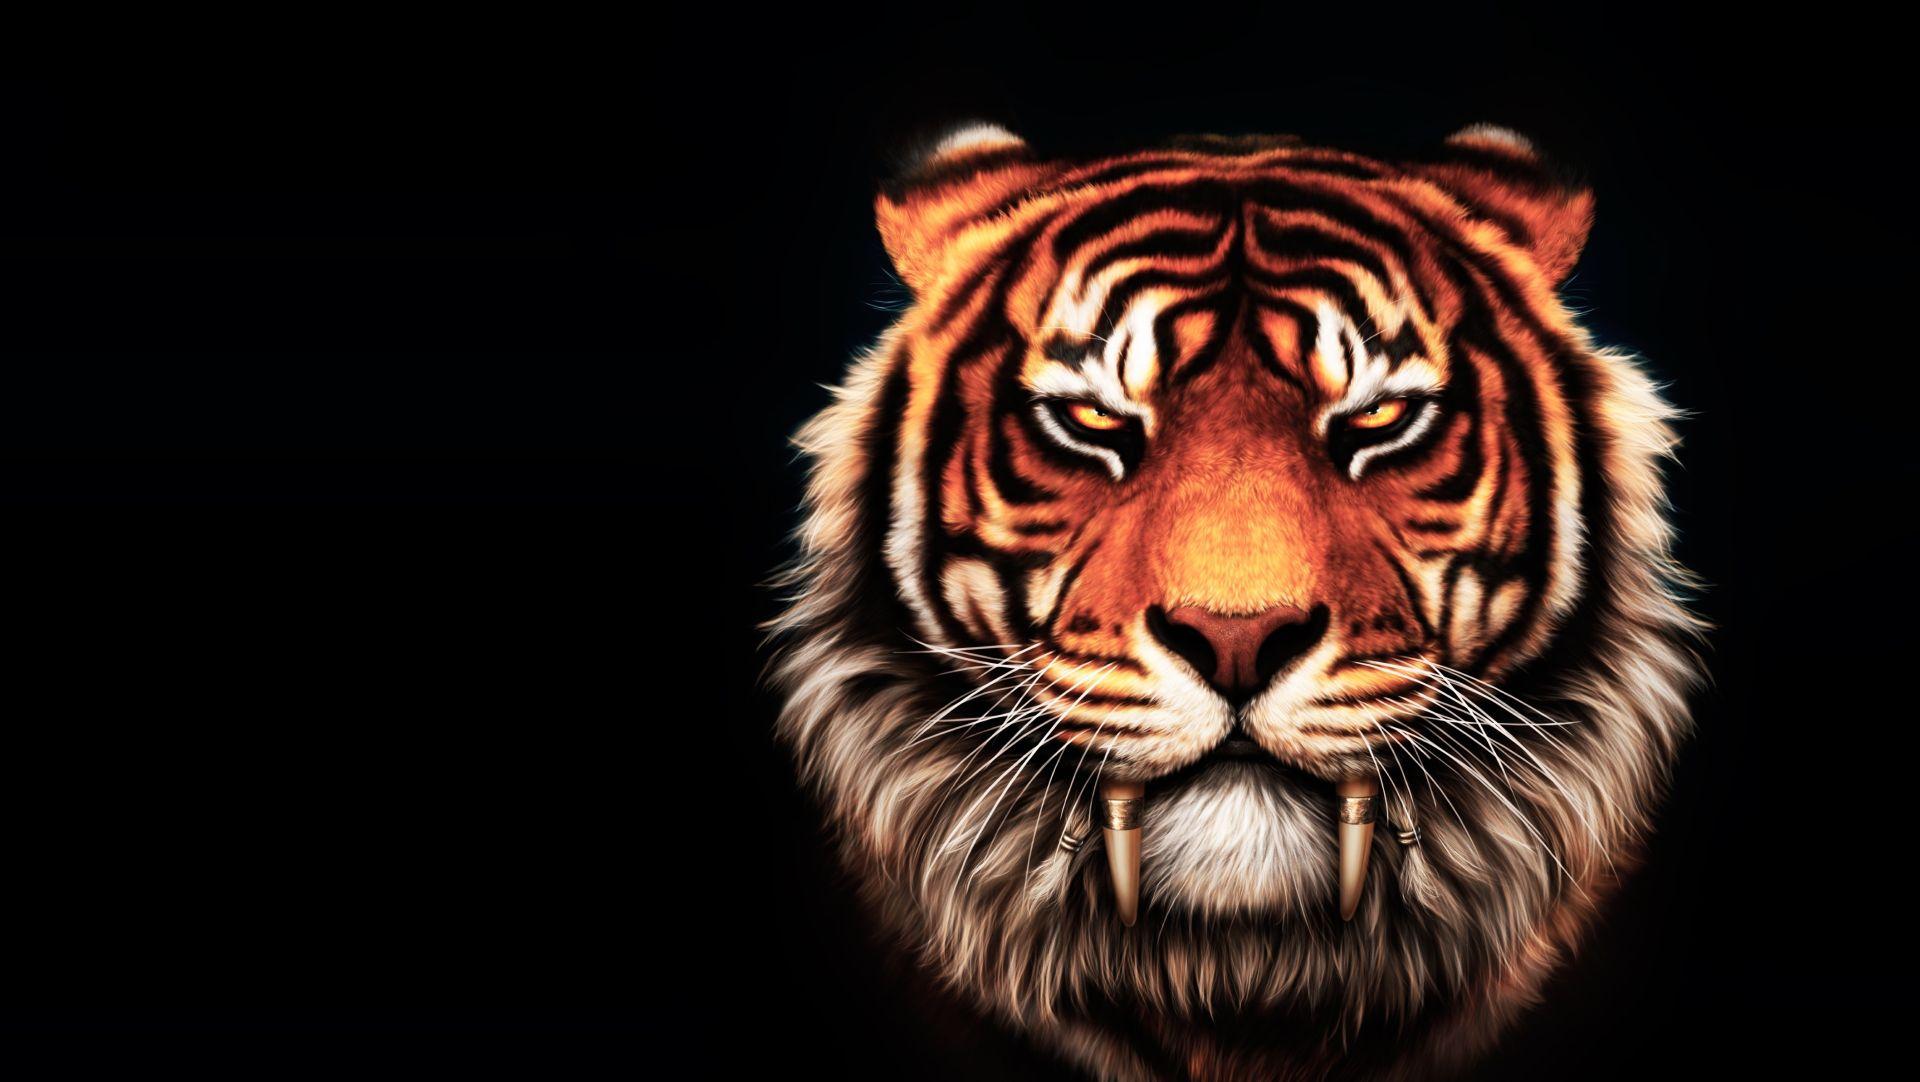 Tiger Art, Free Desktop Wallpaper